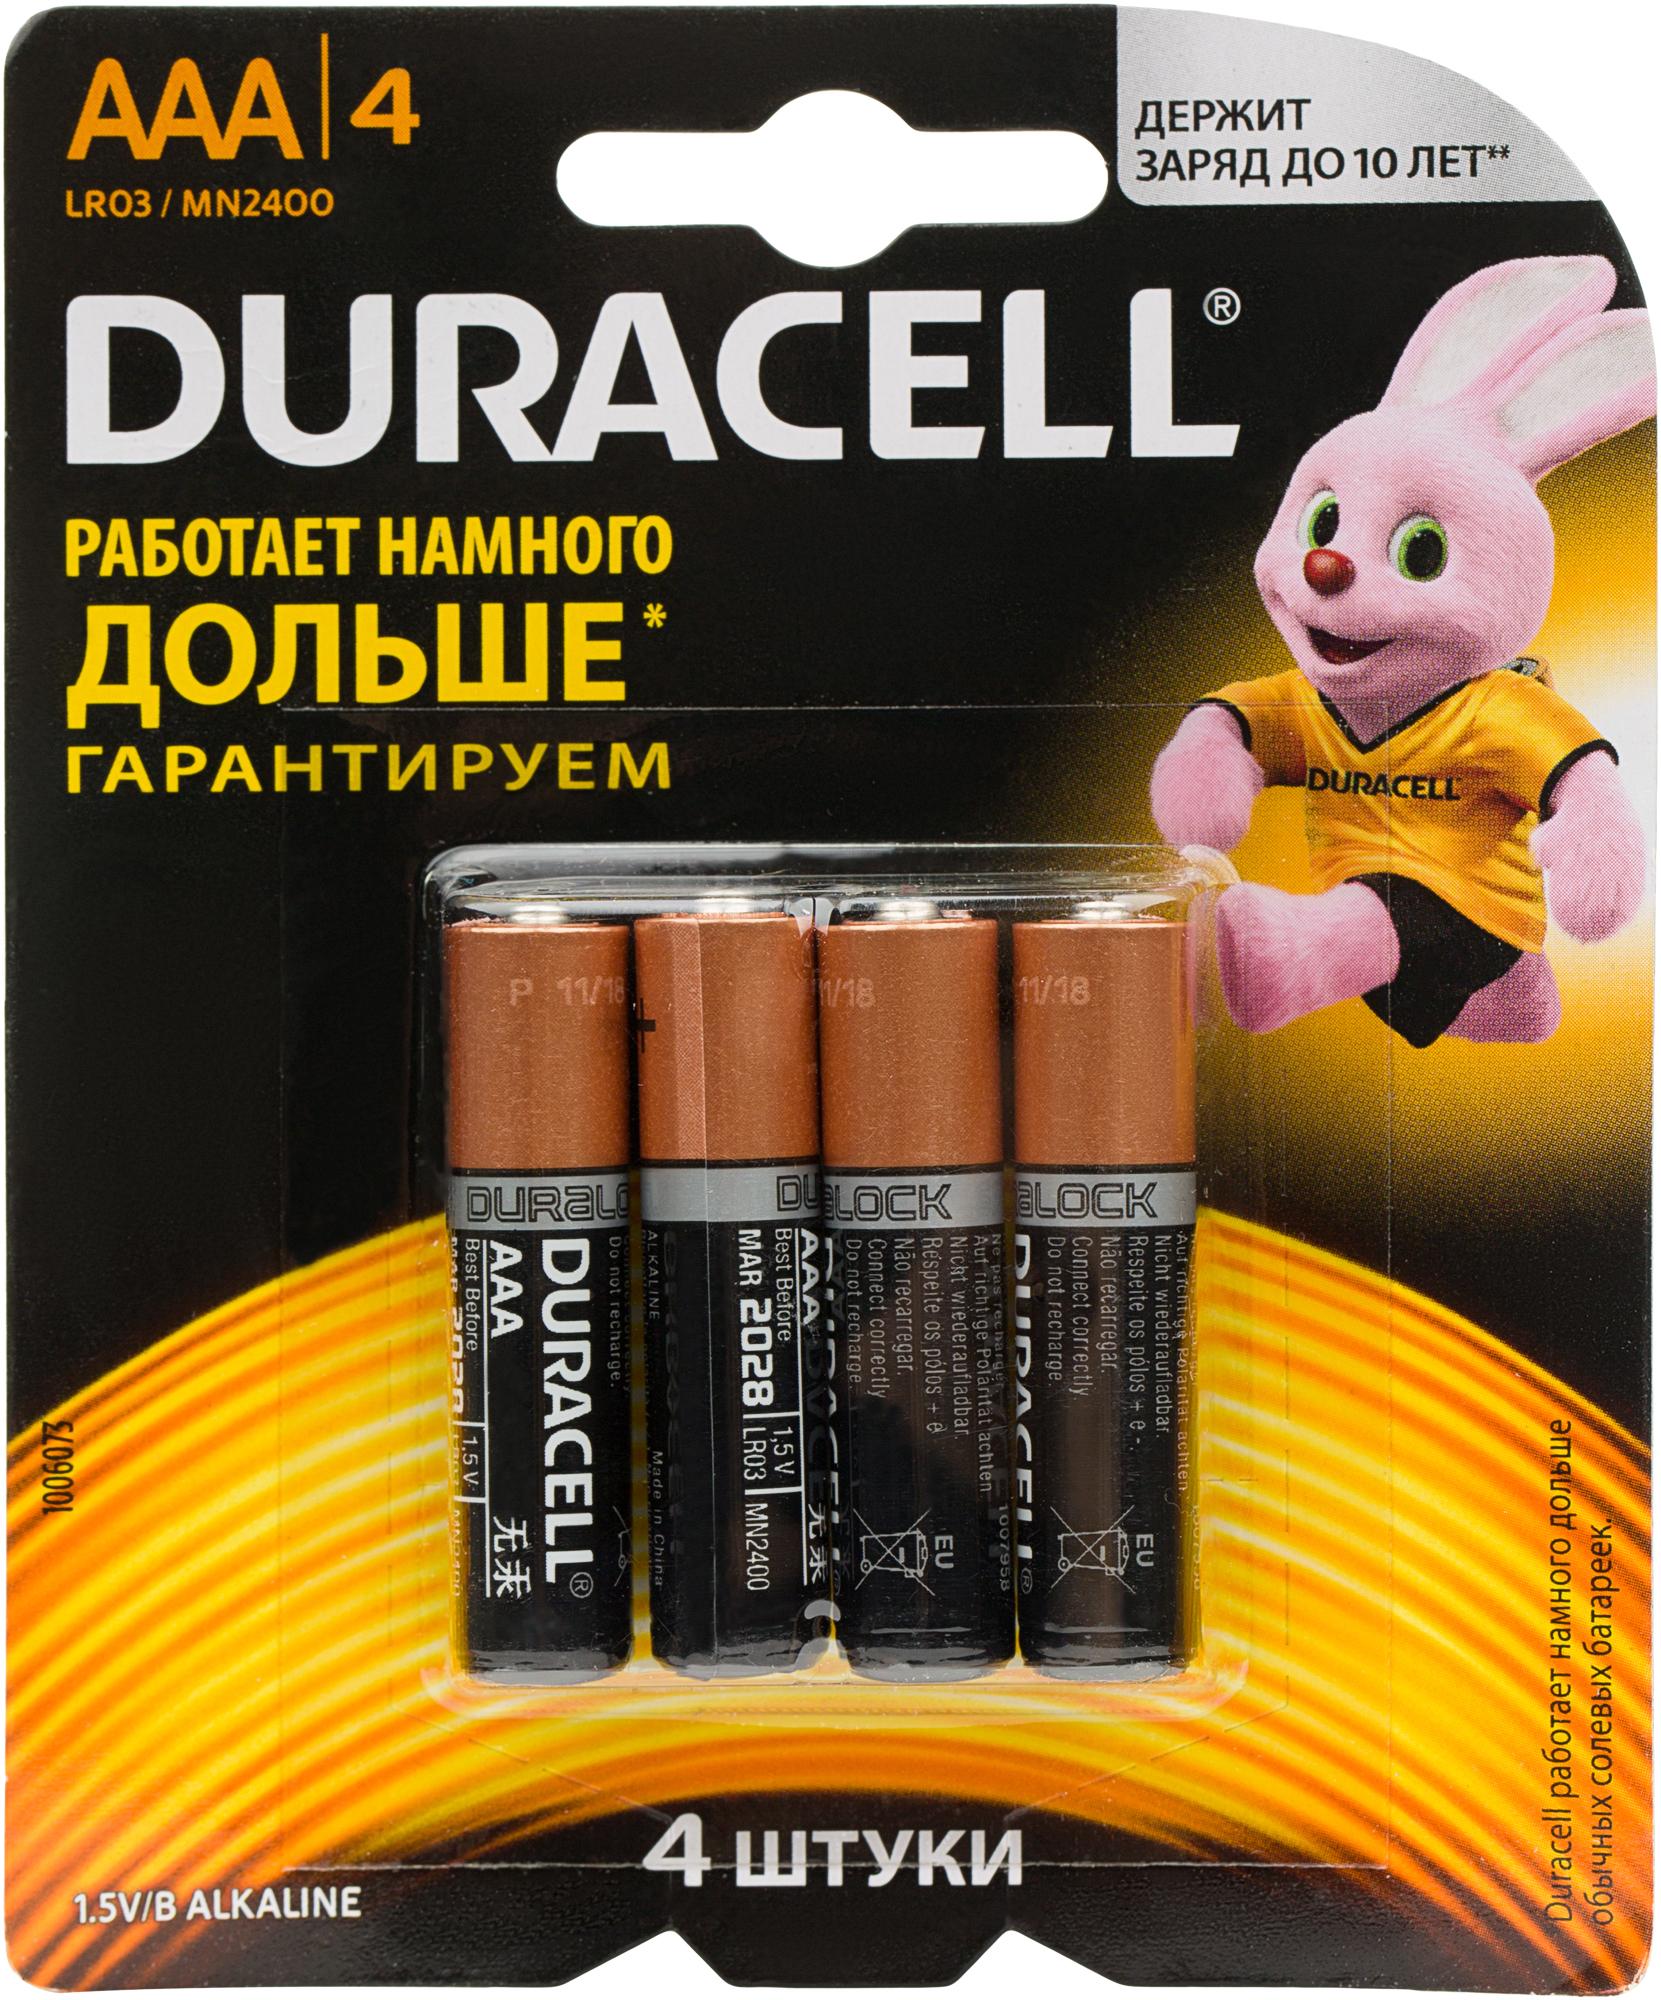 Duracell Батарейки щелочные BASIC CN ААА/LR03, 4 шт.